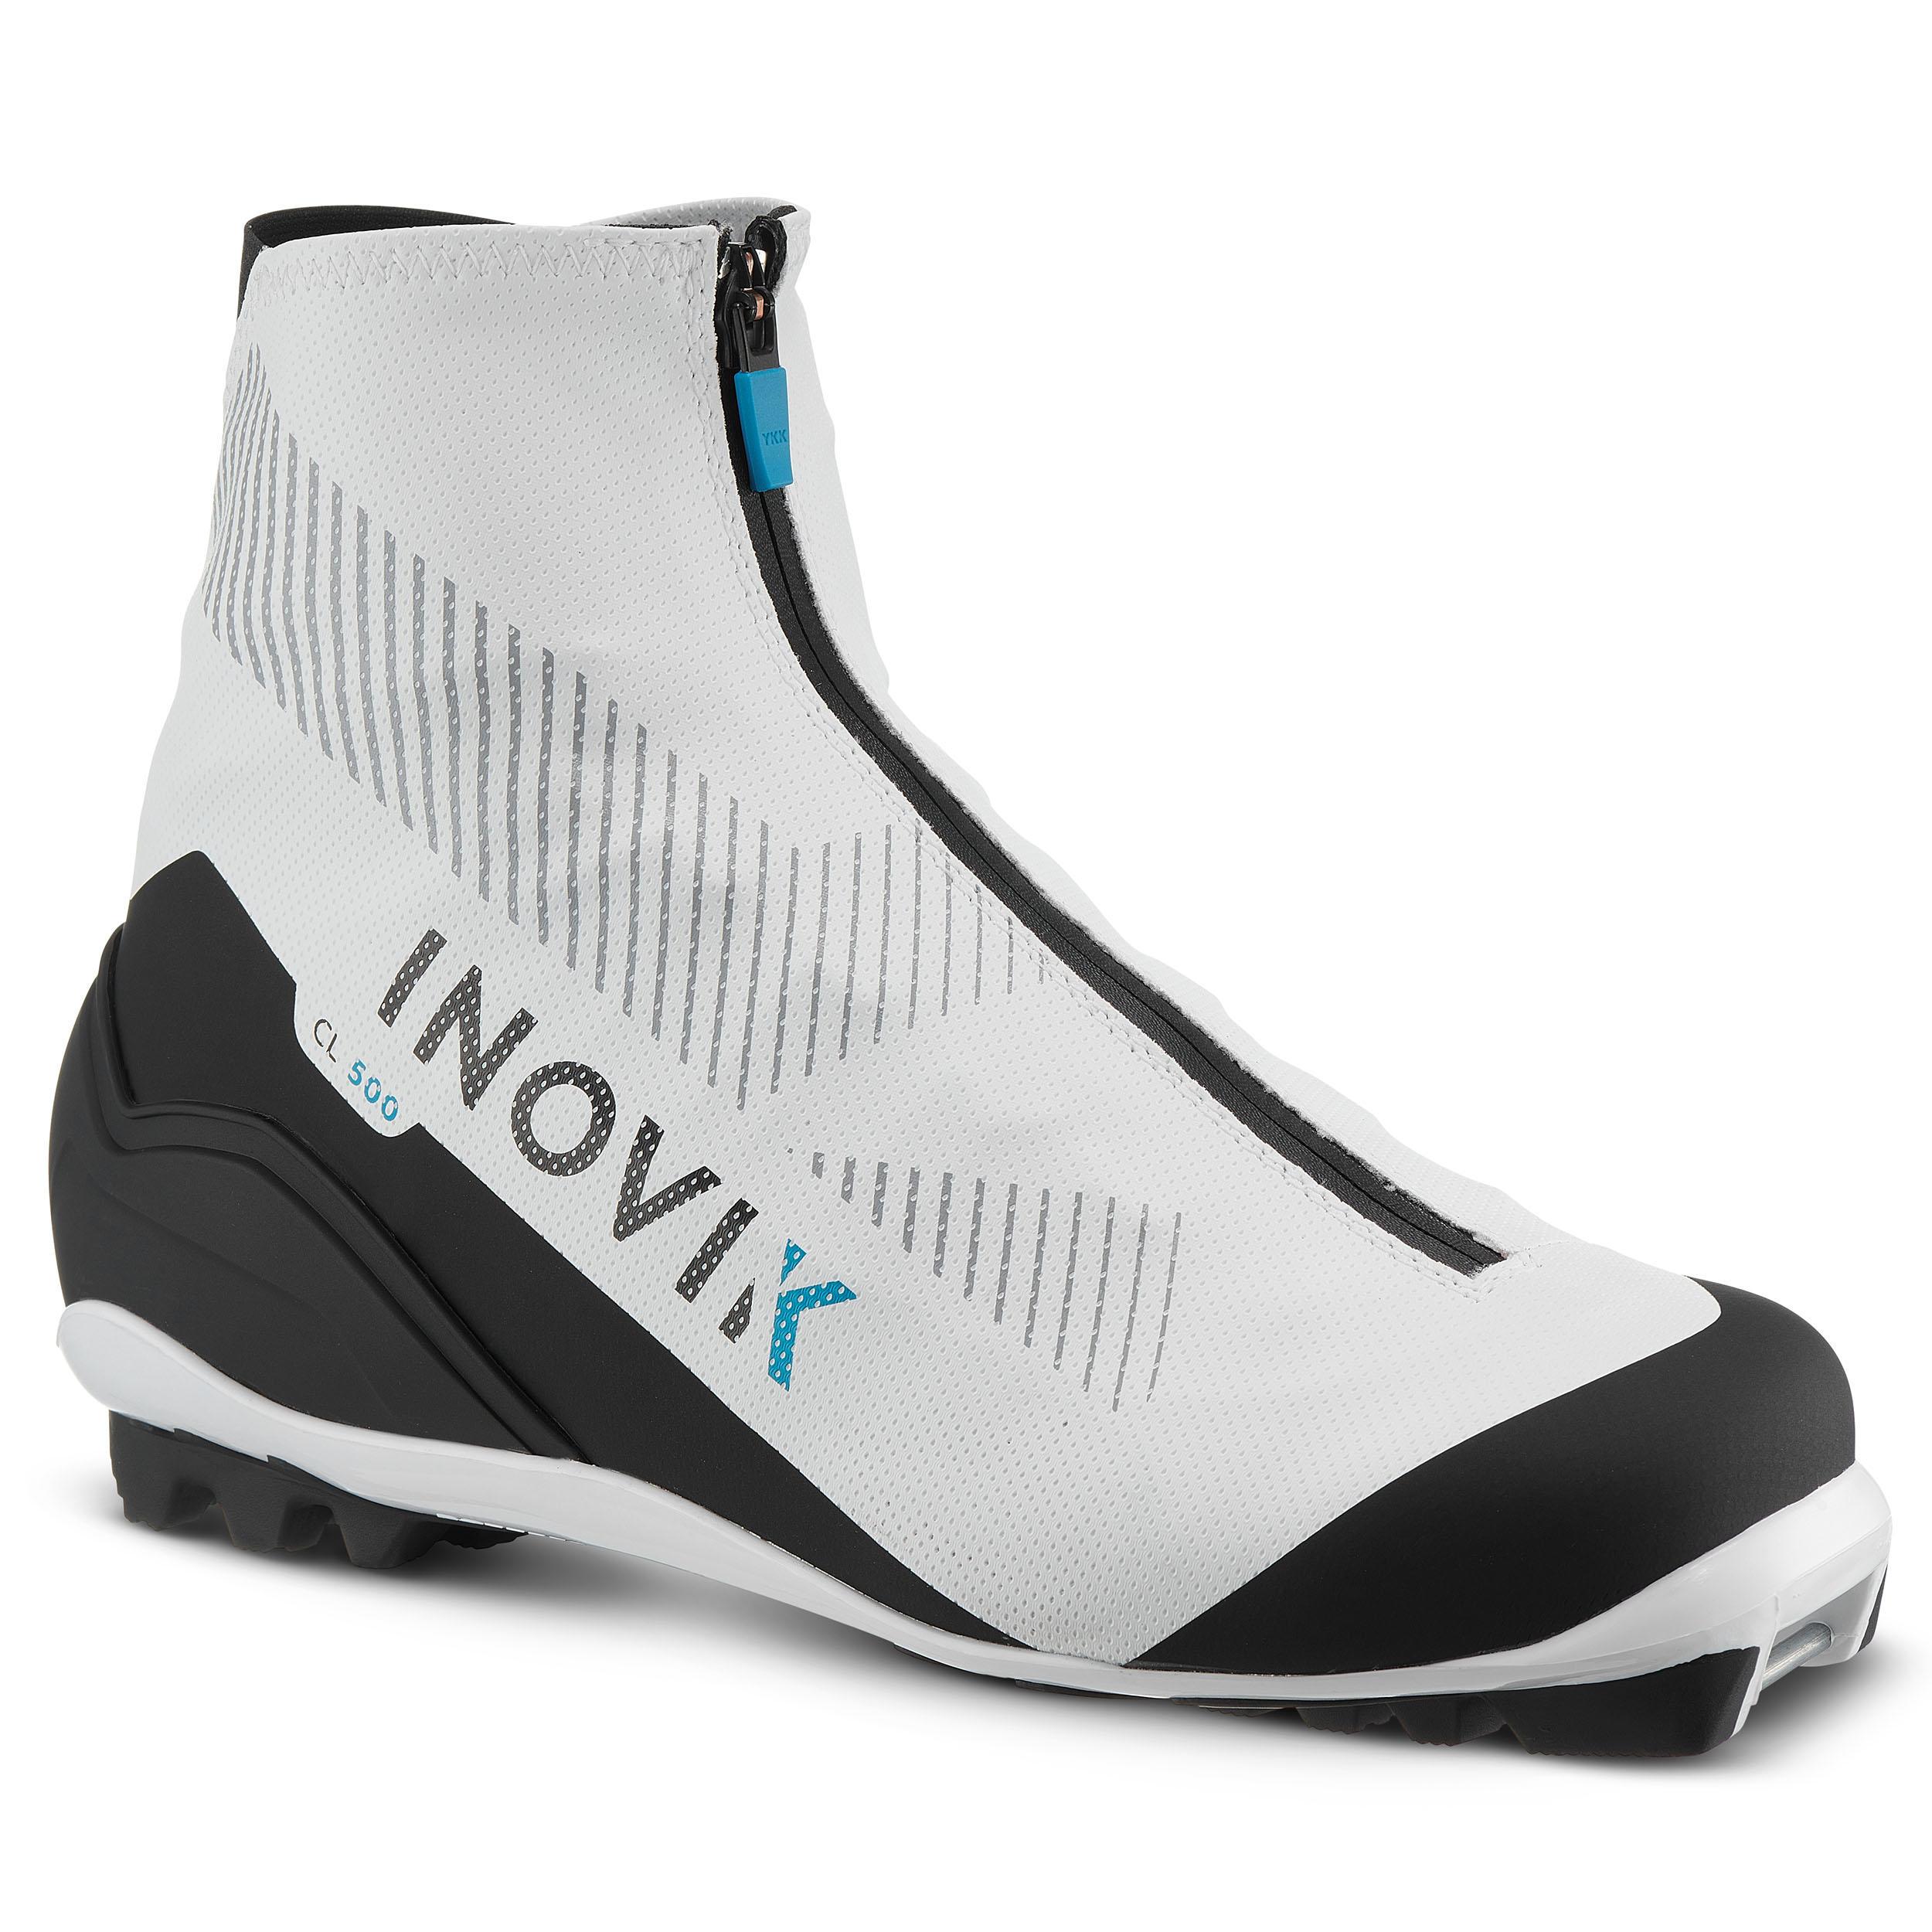 Clăpari schi fond XC S 500 imagine produs